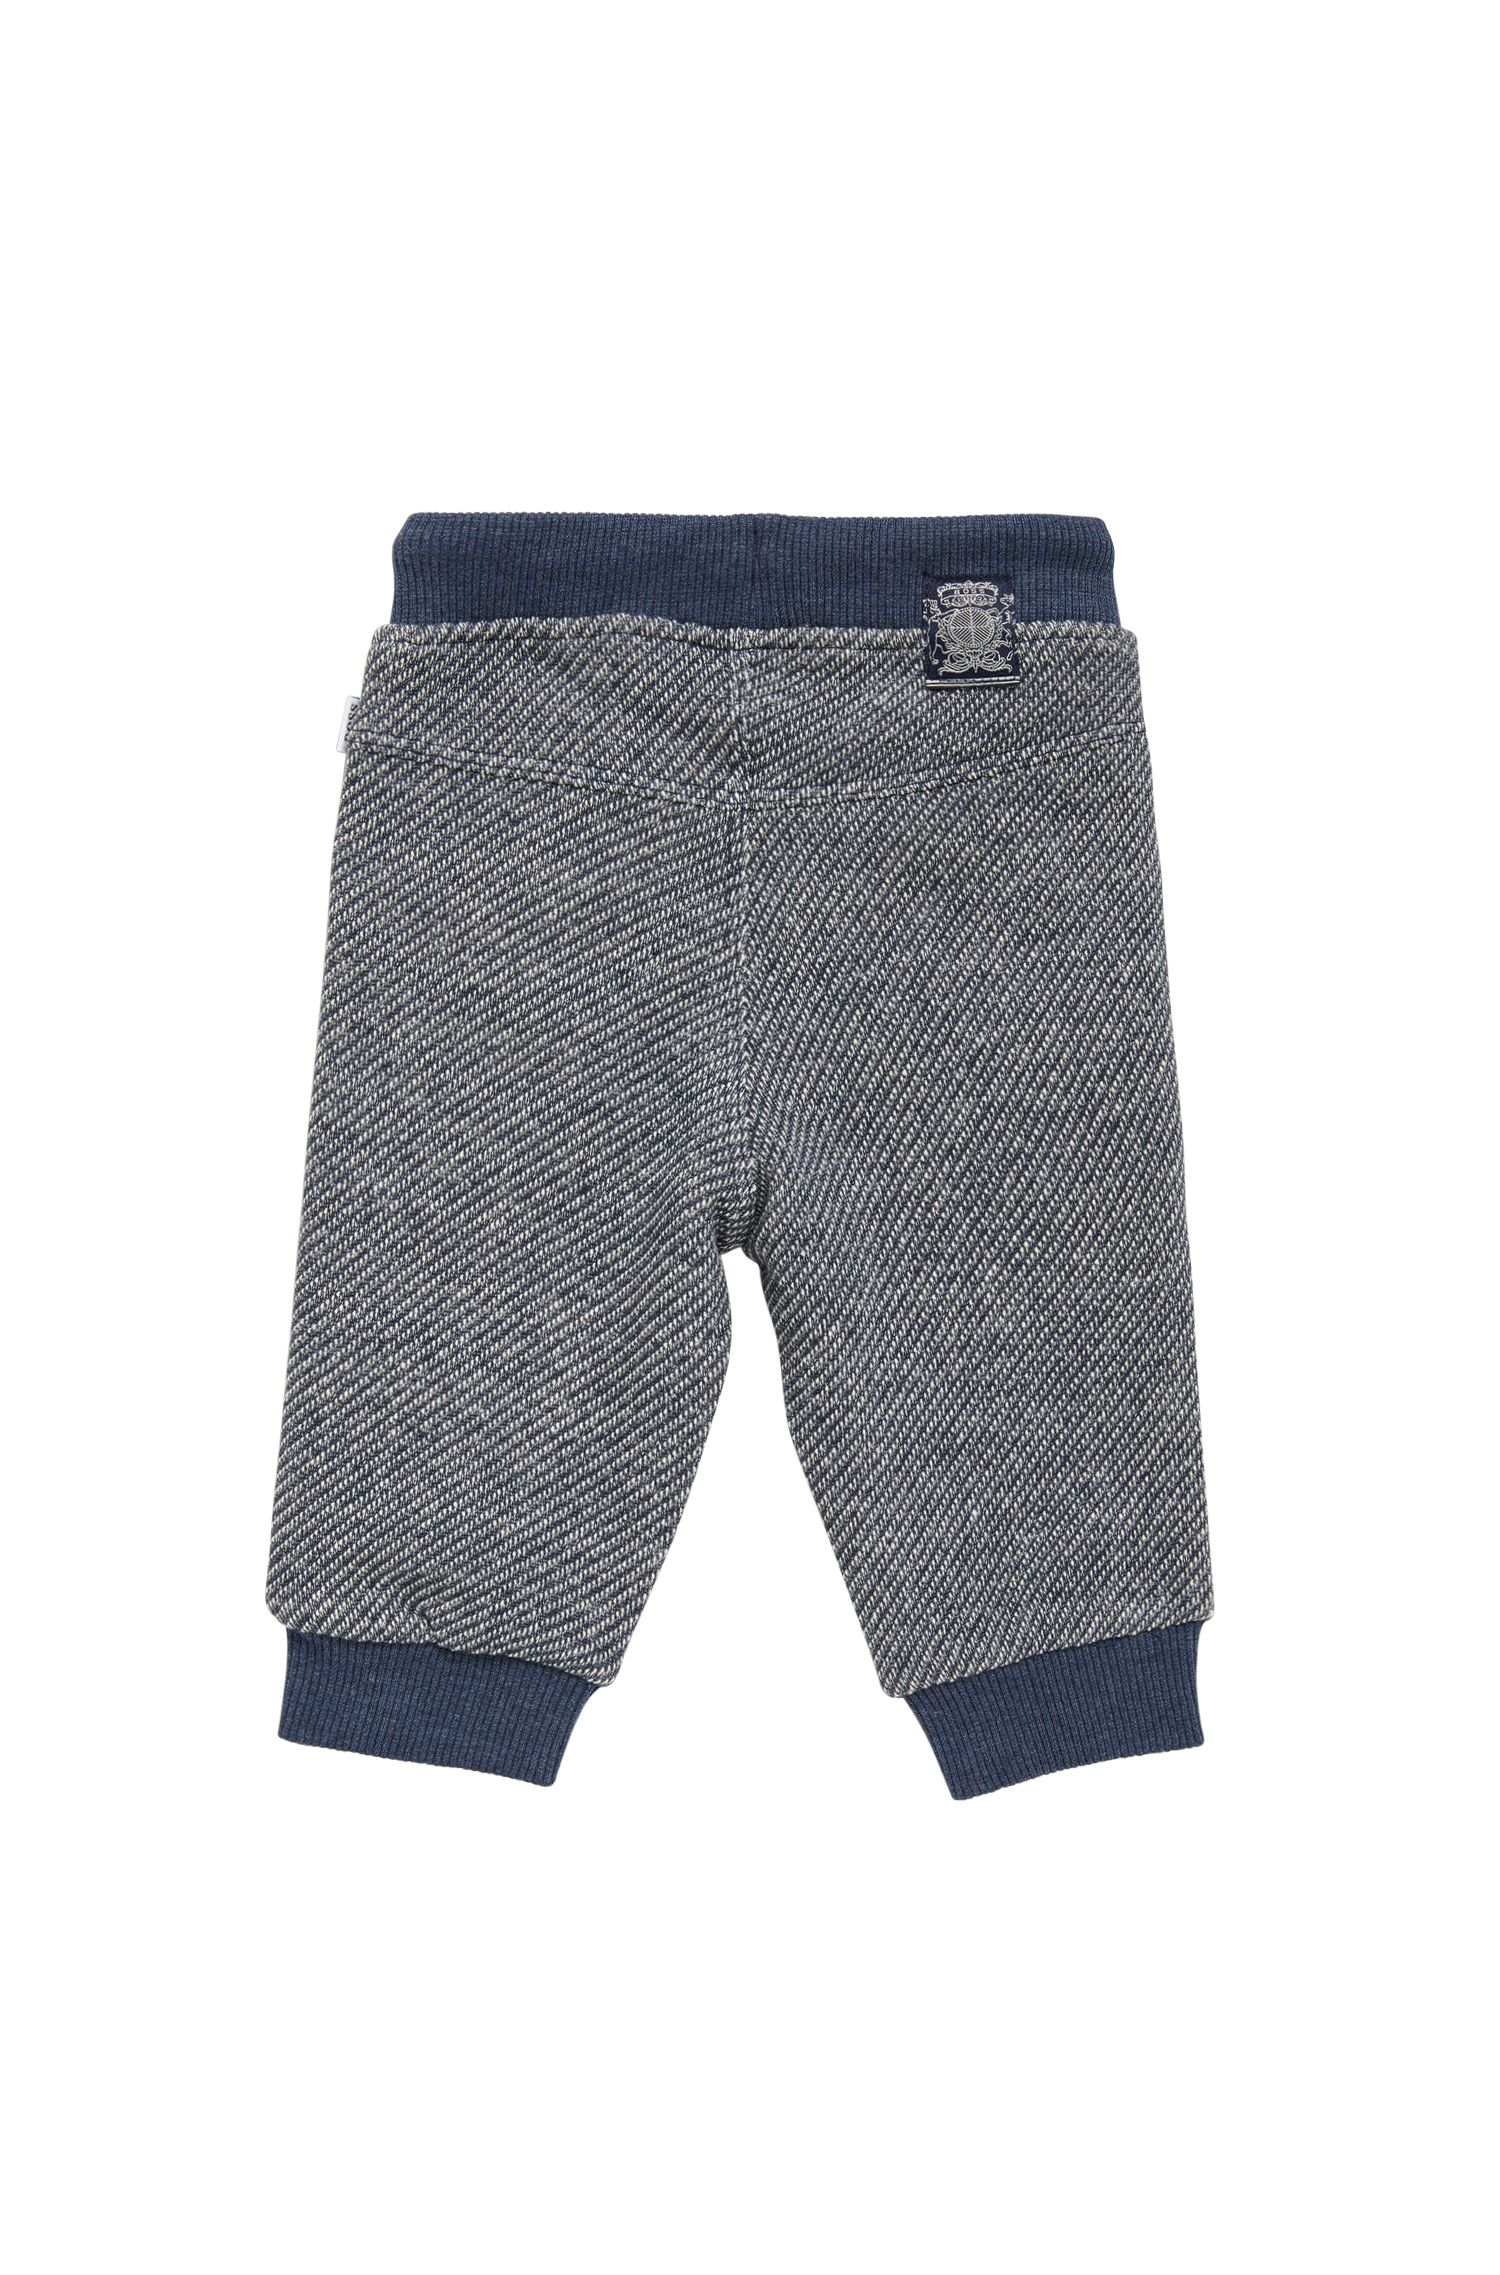 Pantalon sweat pour enfant en coton avec cordon de serrage: «J04245»